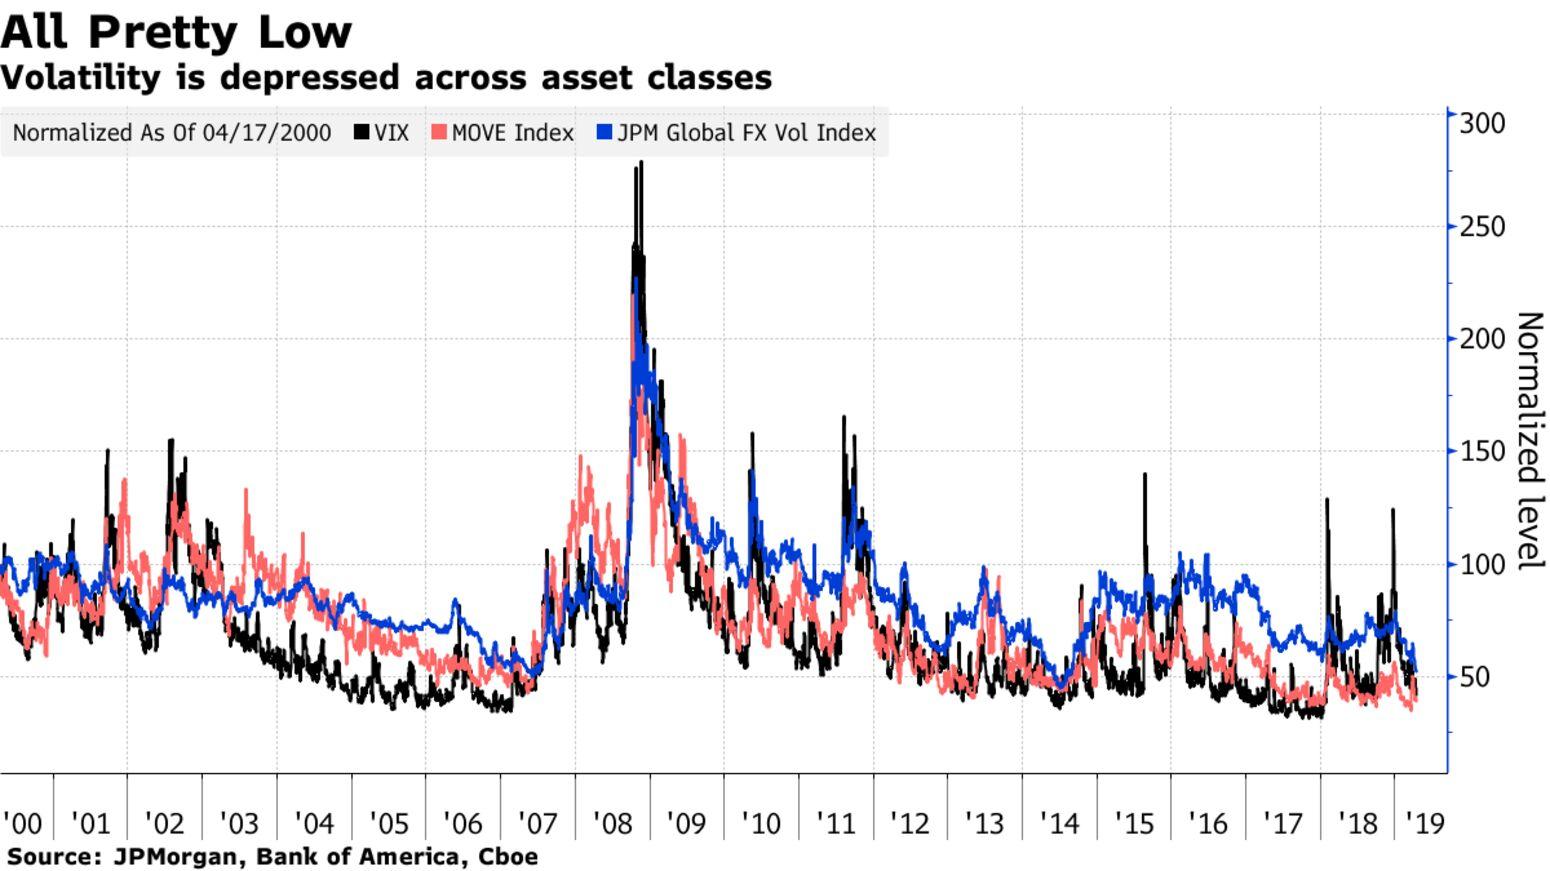 Volatility is depressed across asset classes